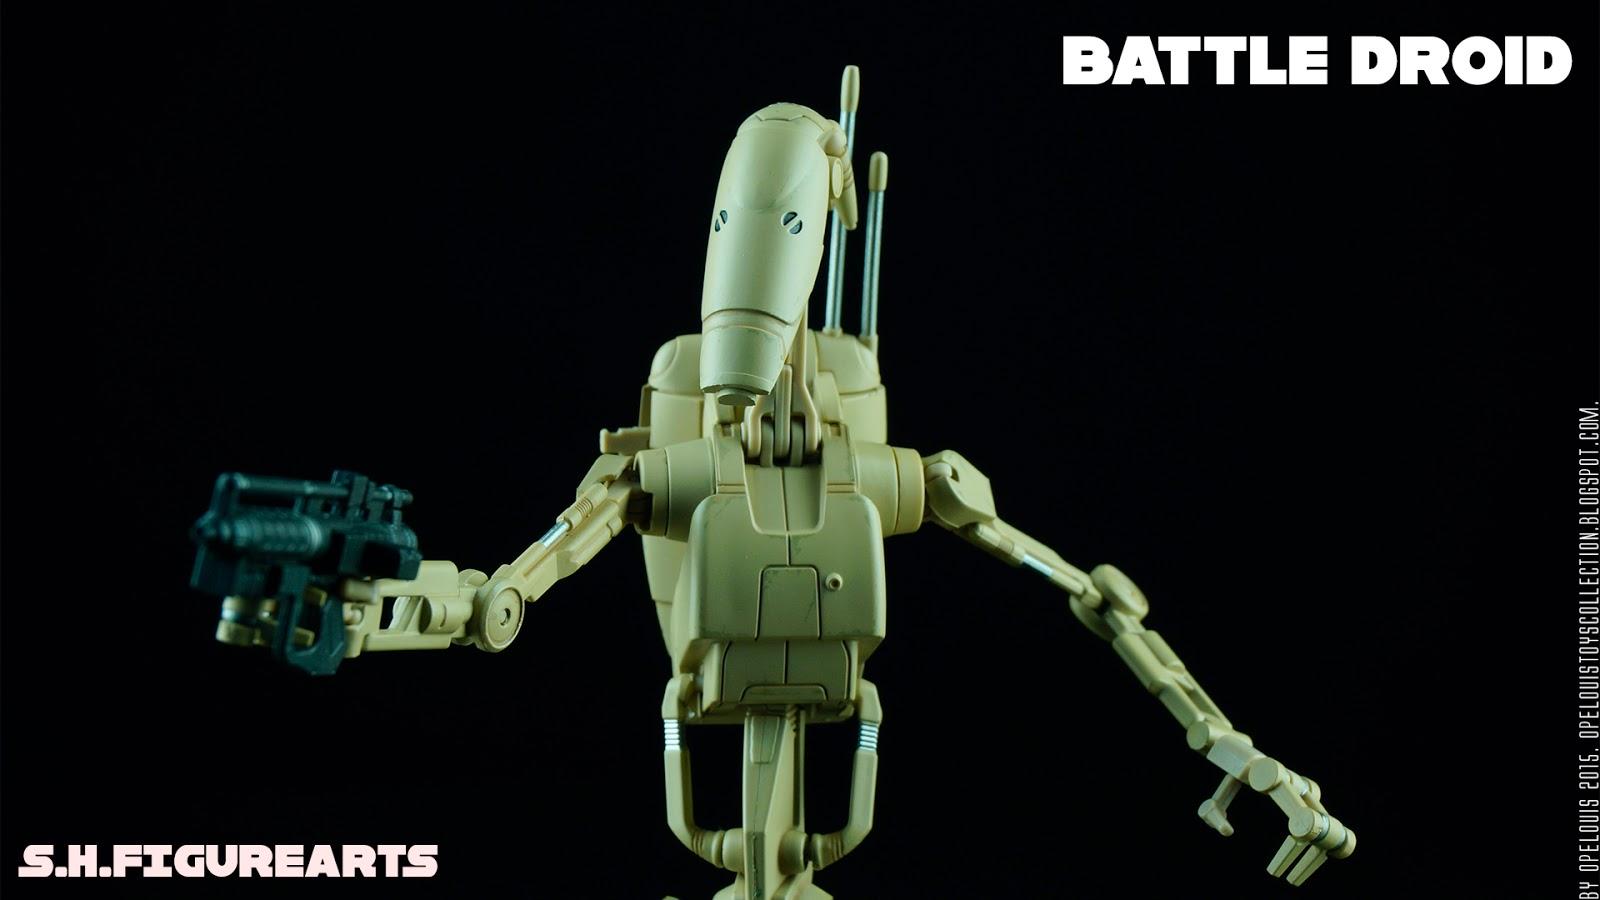 Opelouis S Toys Collection Shfigurearts Star Wars The Phantom Manace Battle Droid